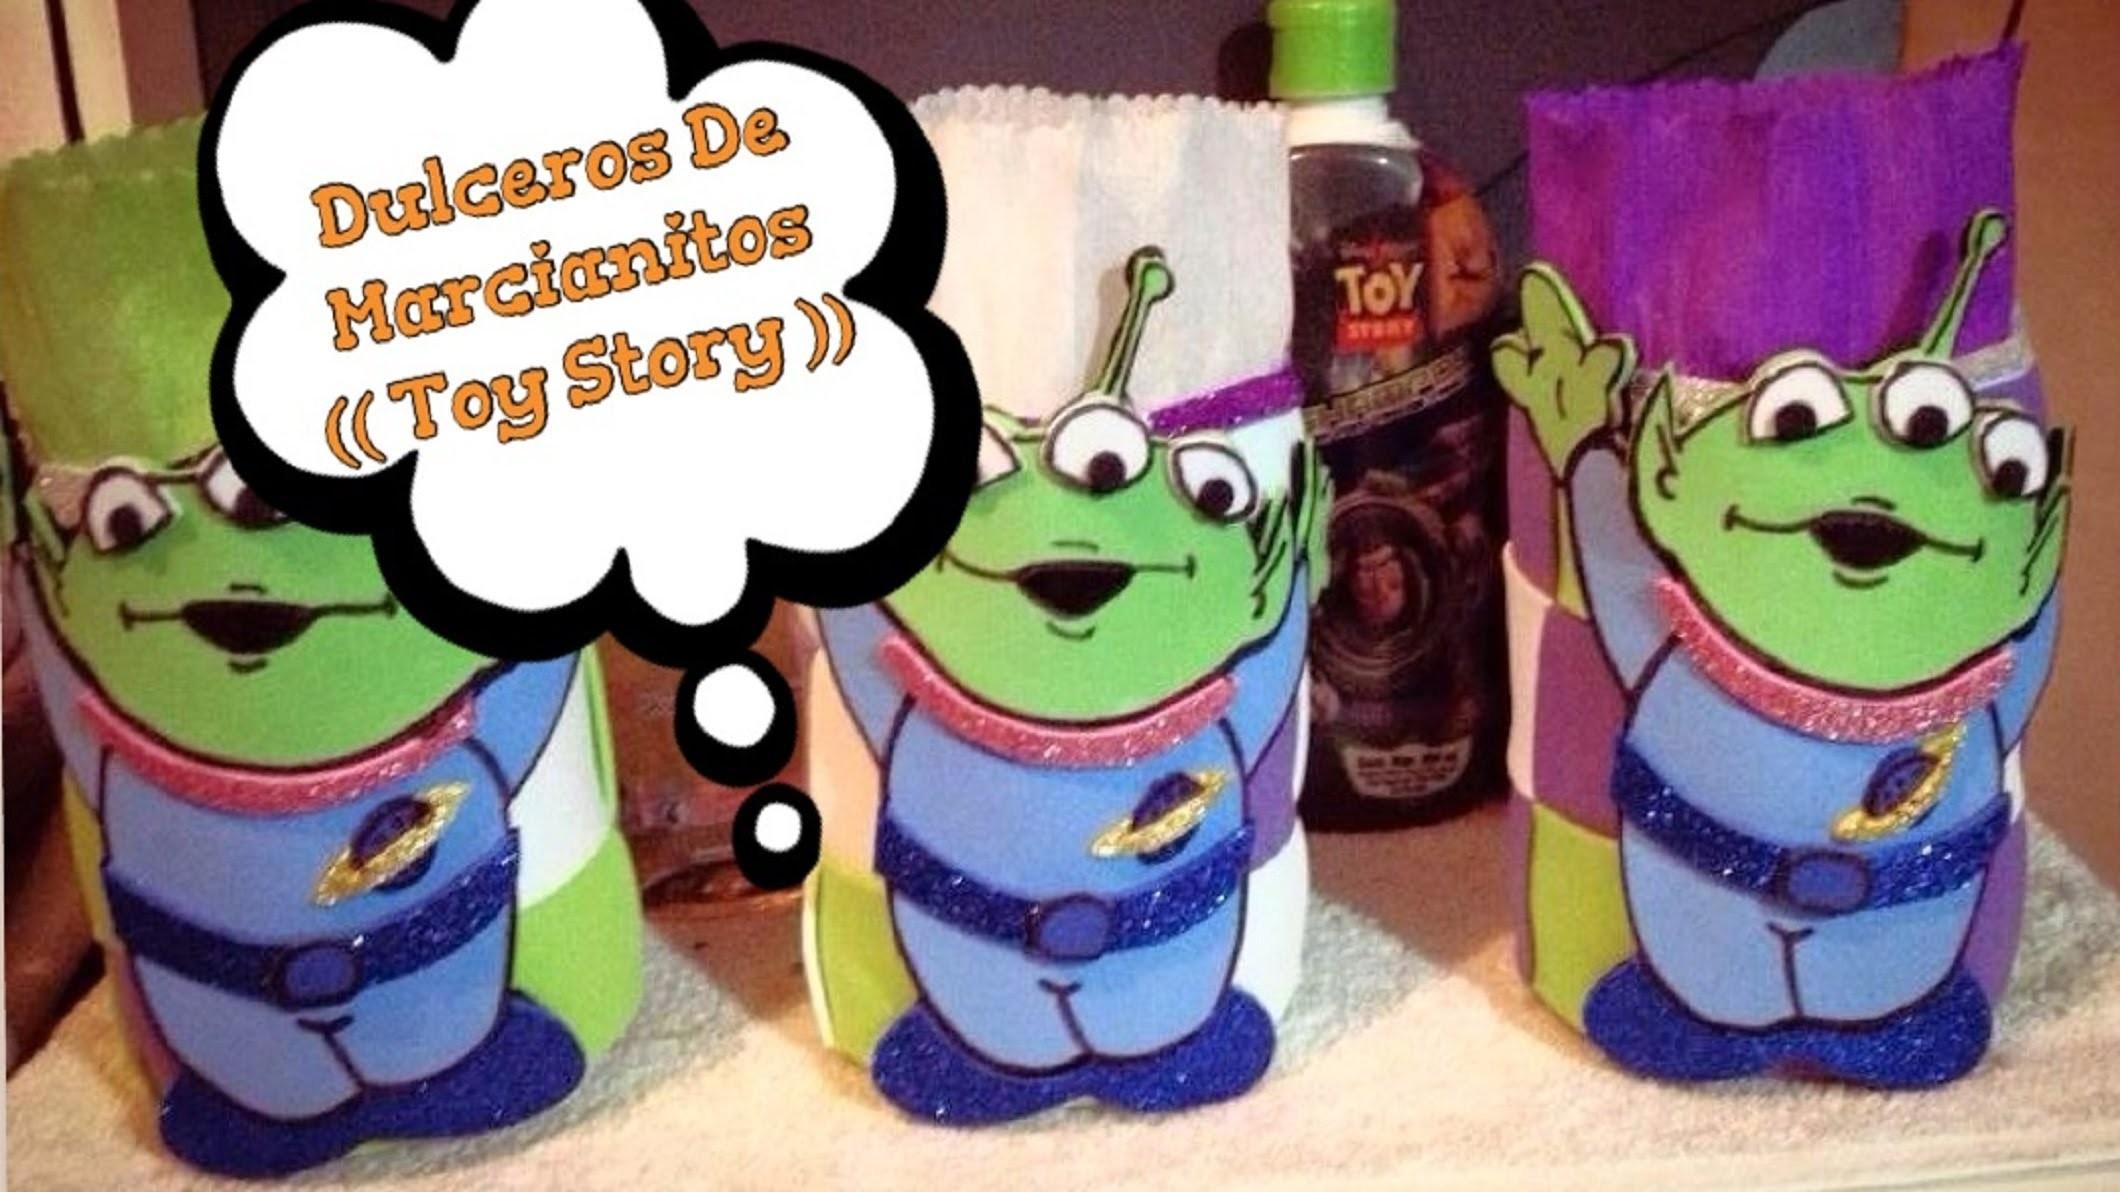 Dulcero De Marcianito (( Toy Story ))